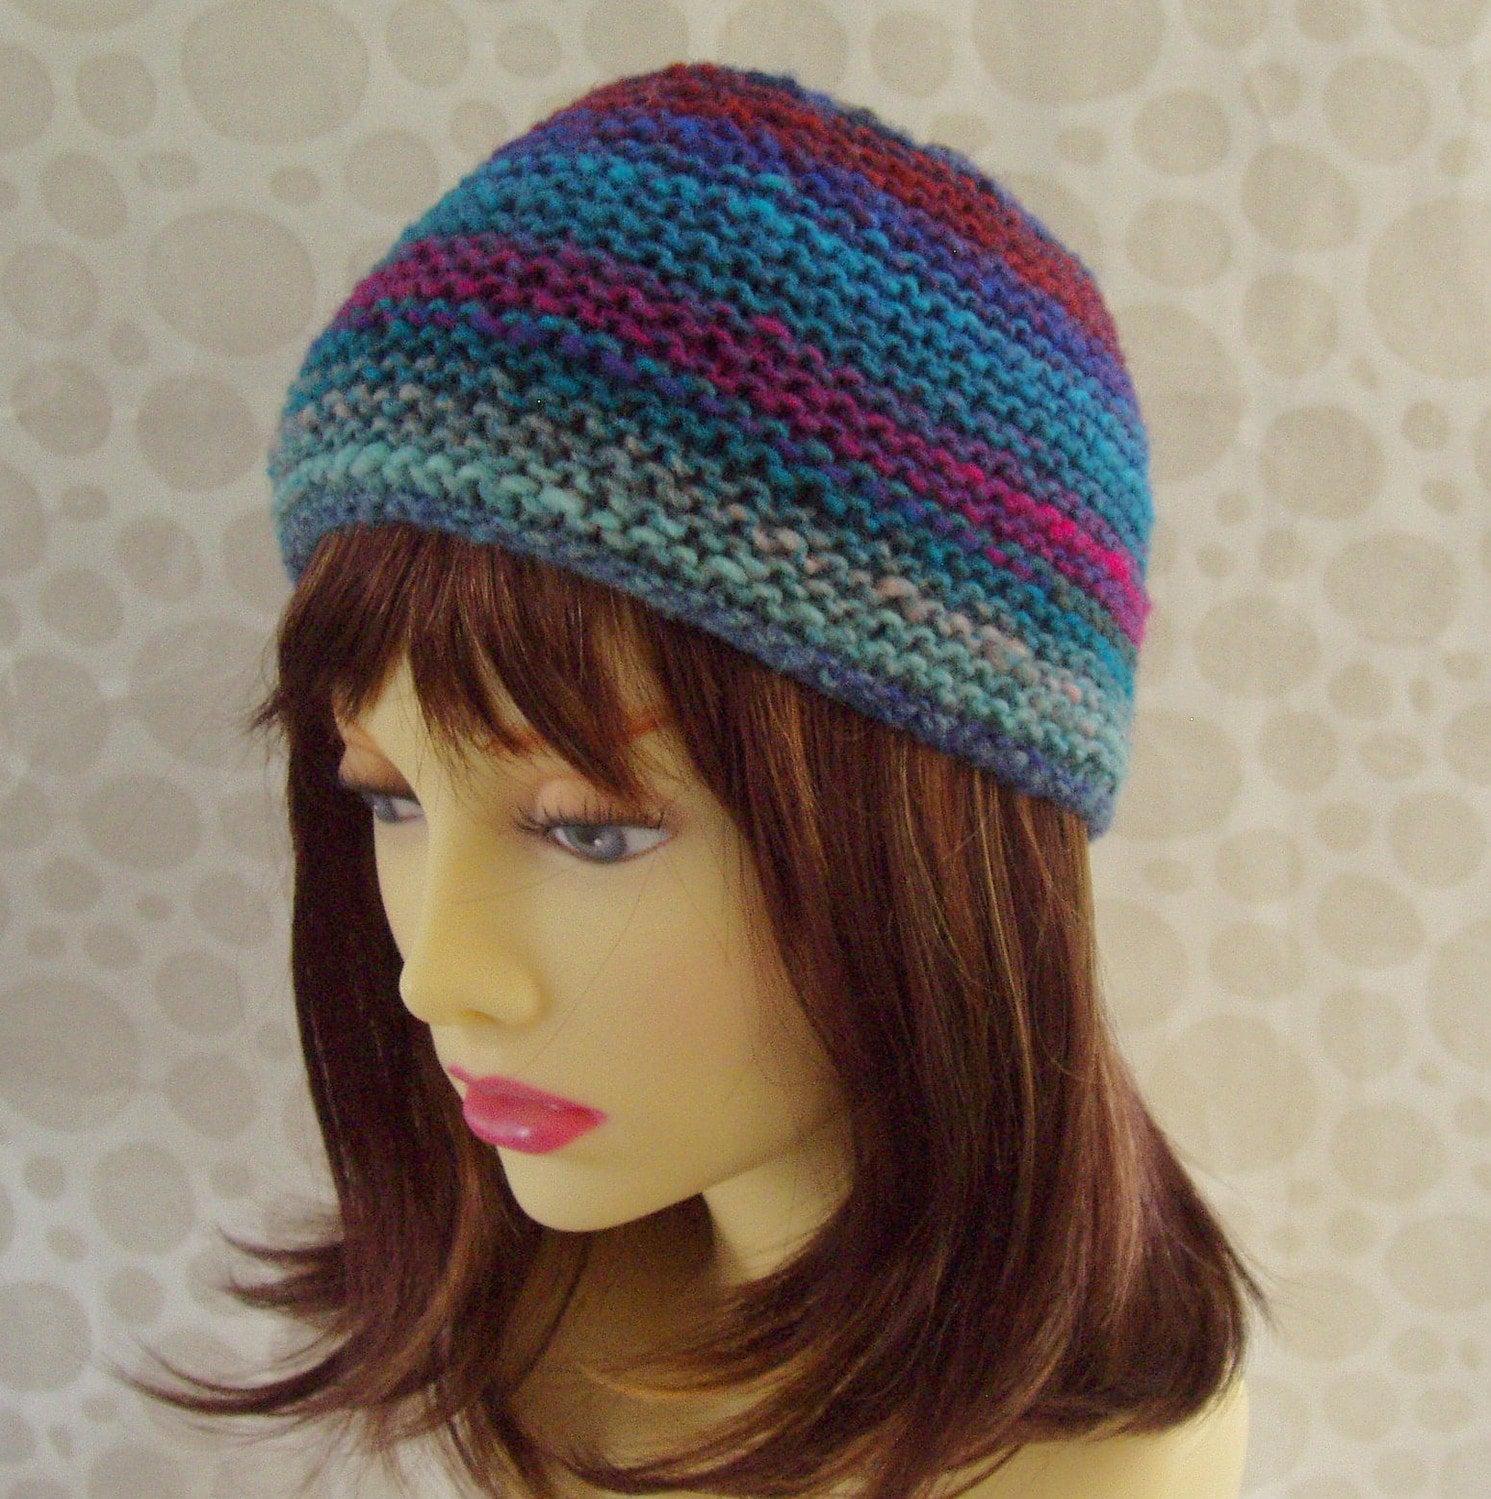 KNITTING Pattern/ SANTA FE/ Mans Hat in Luxury Noro Wool/Knit Round ...